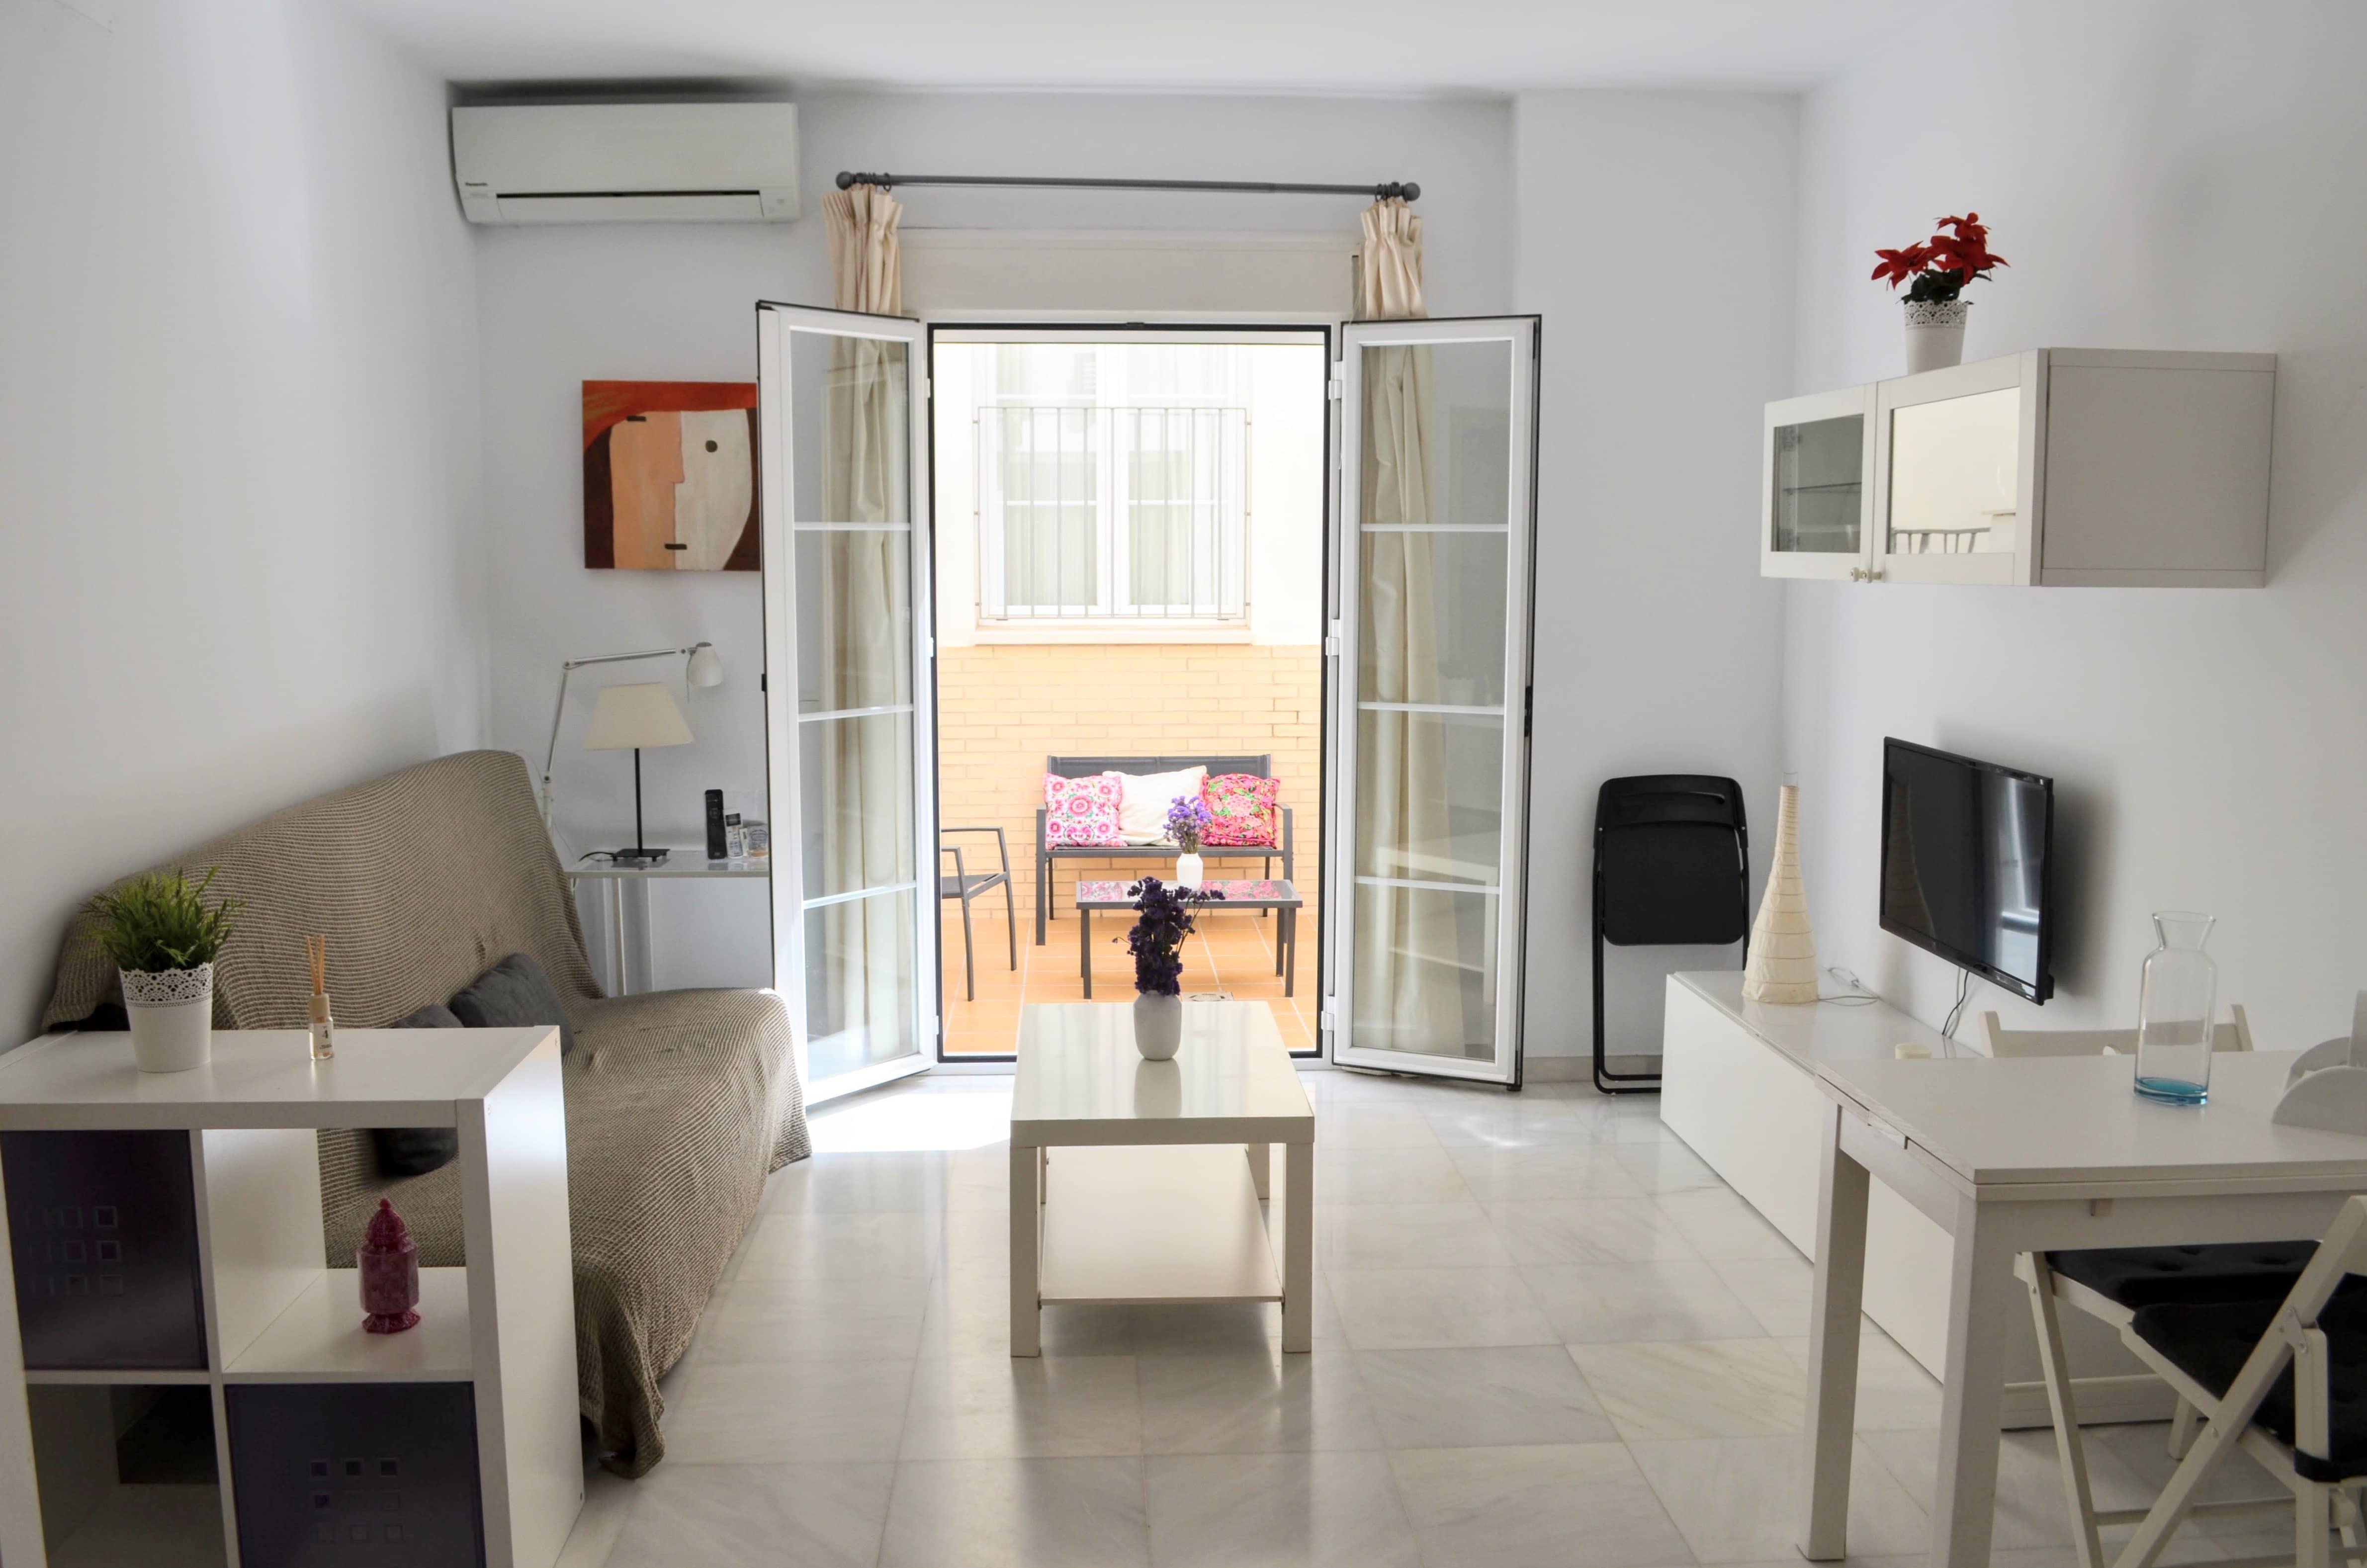 Balneario con dormitorio y terraza privada  0401